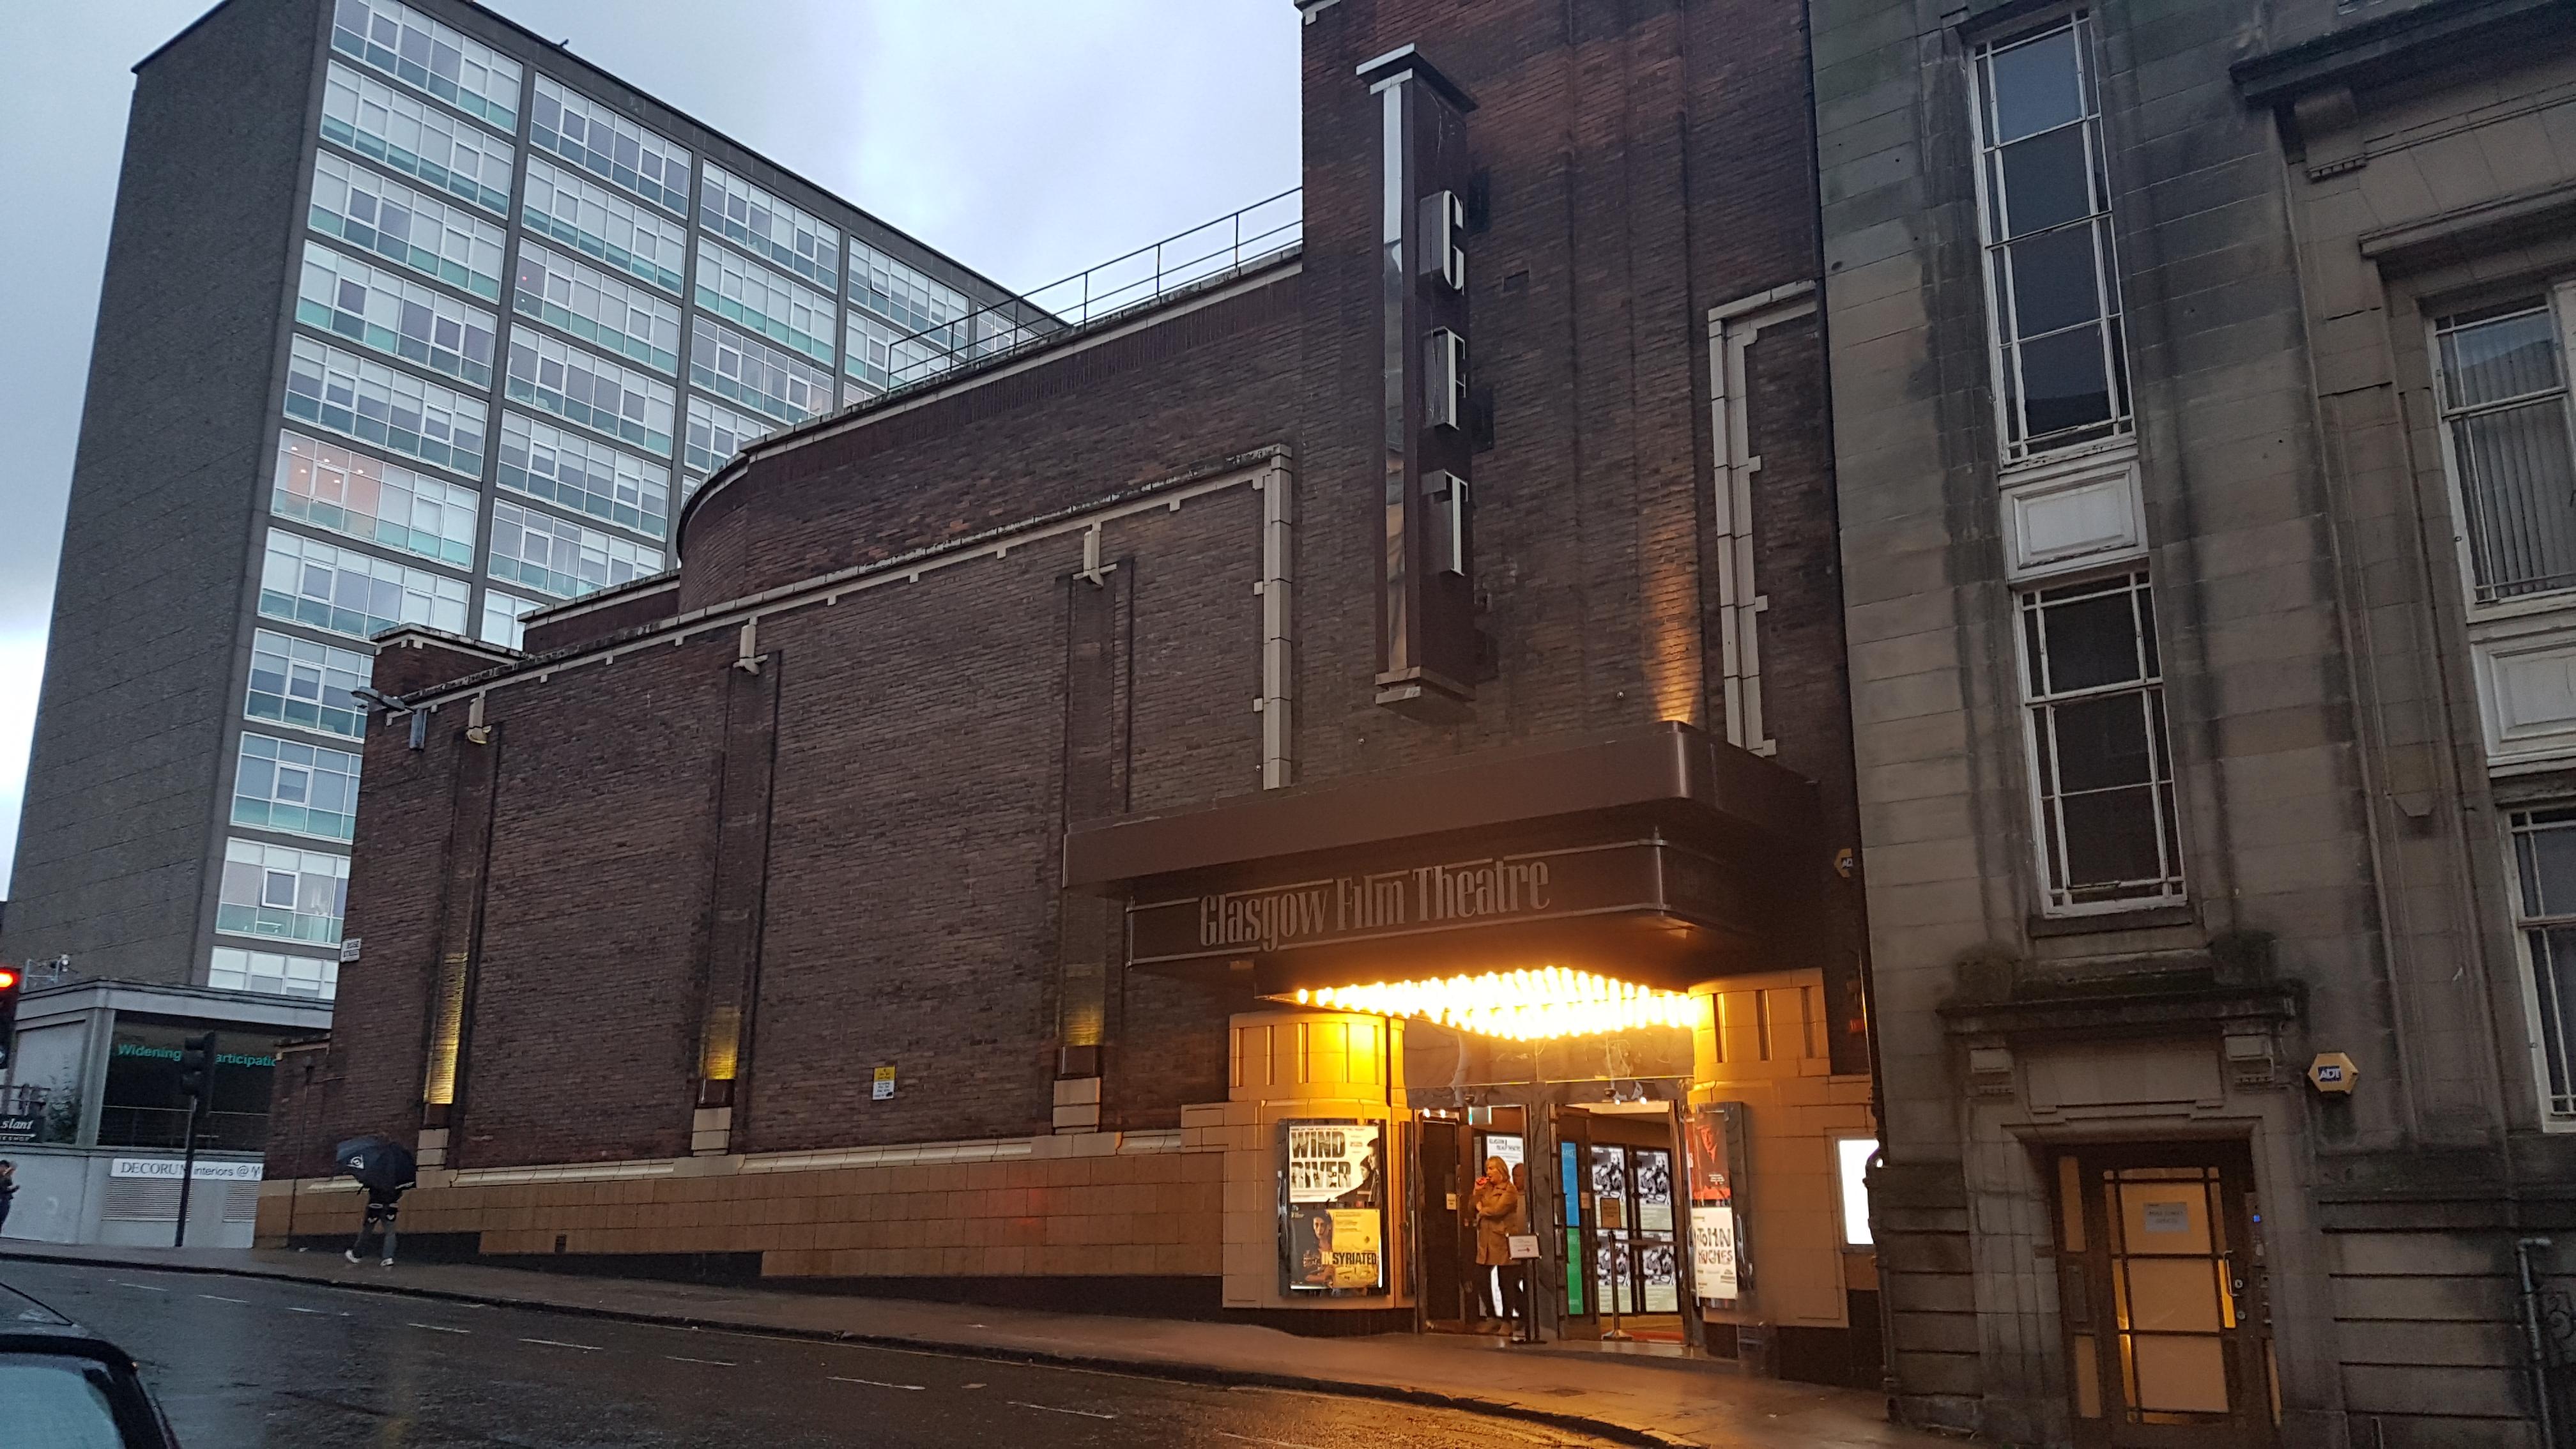 Glasgow Film Theatre, 12 Rose Street, Glasgow.jpg